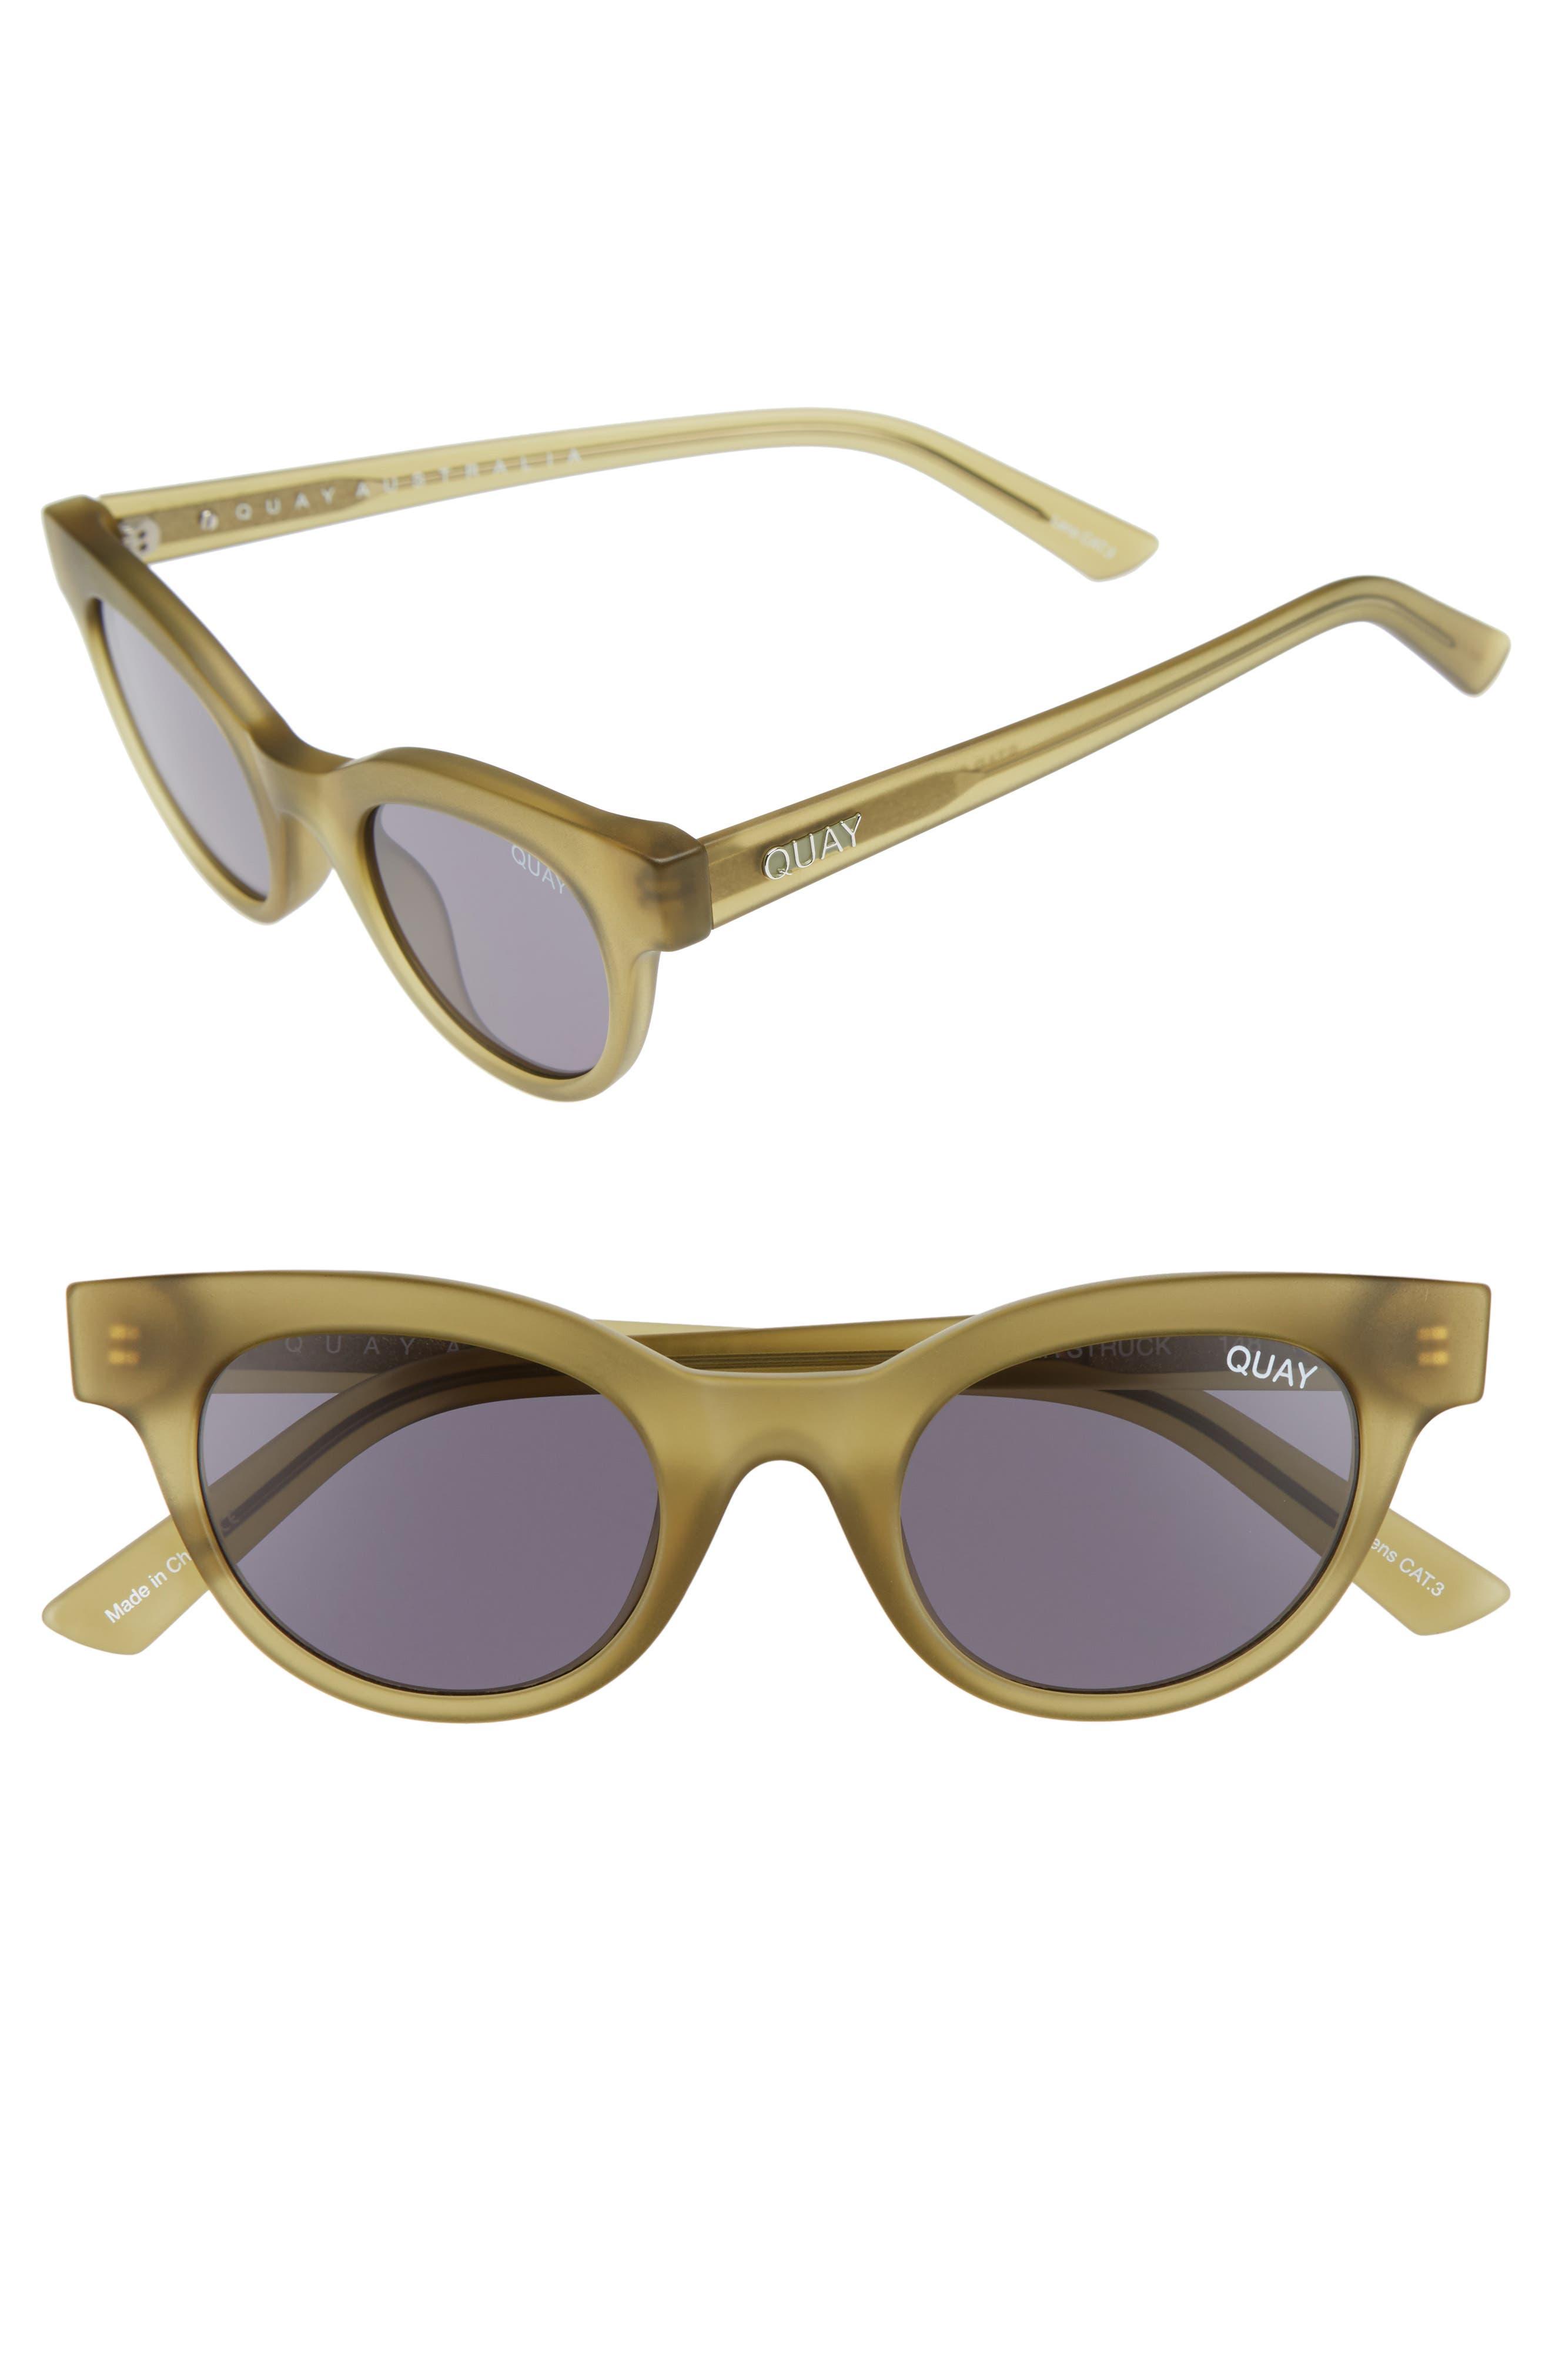 Starstruck 48mm Cat Eye Sunglasses,                             Main thumbnail 1, color,                             300